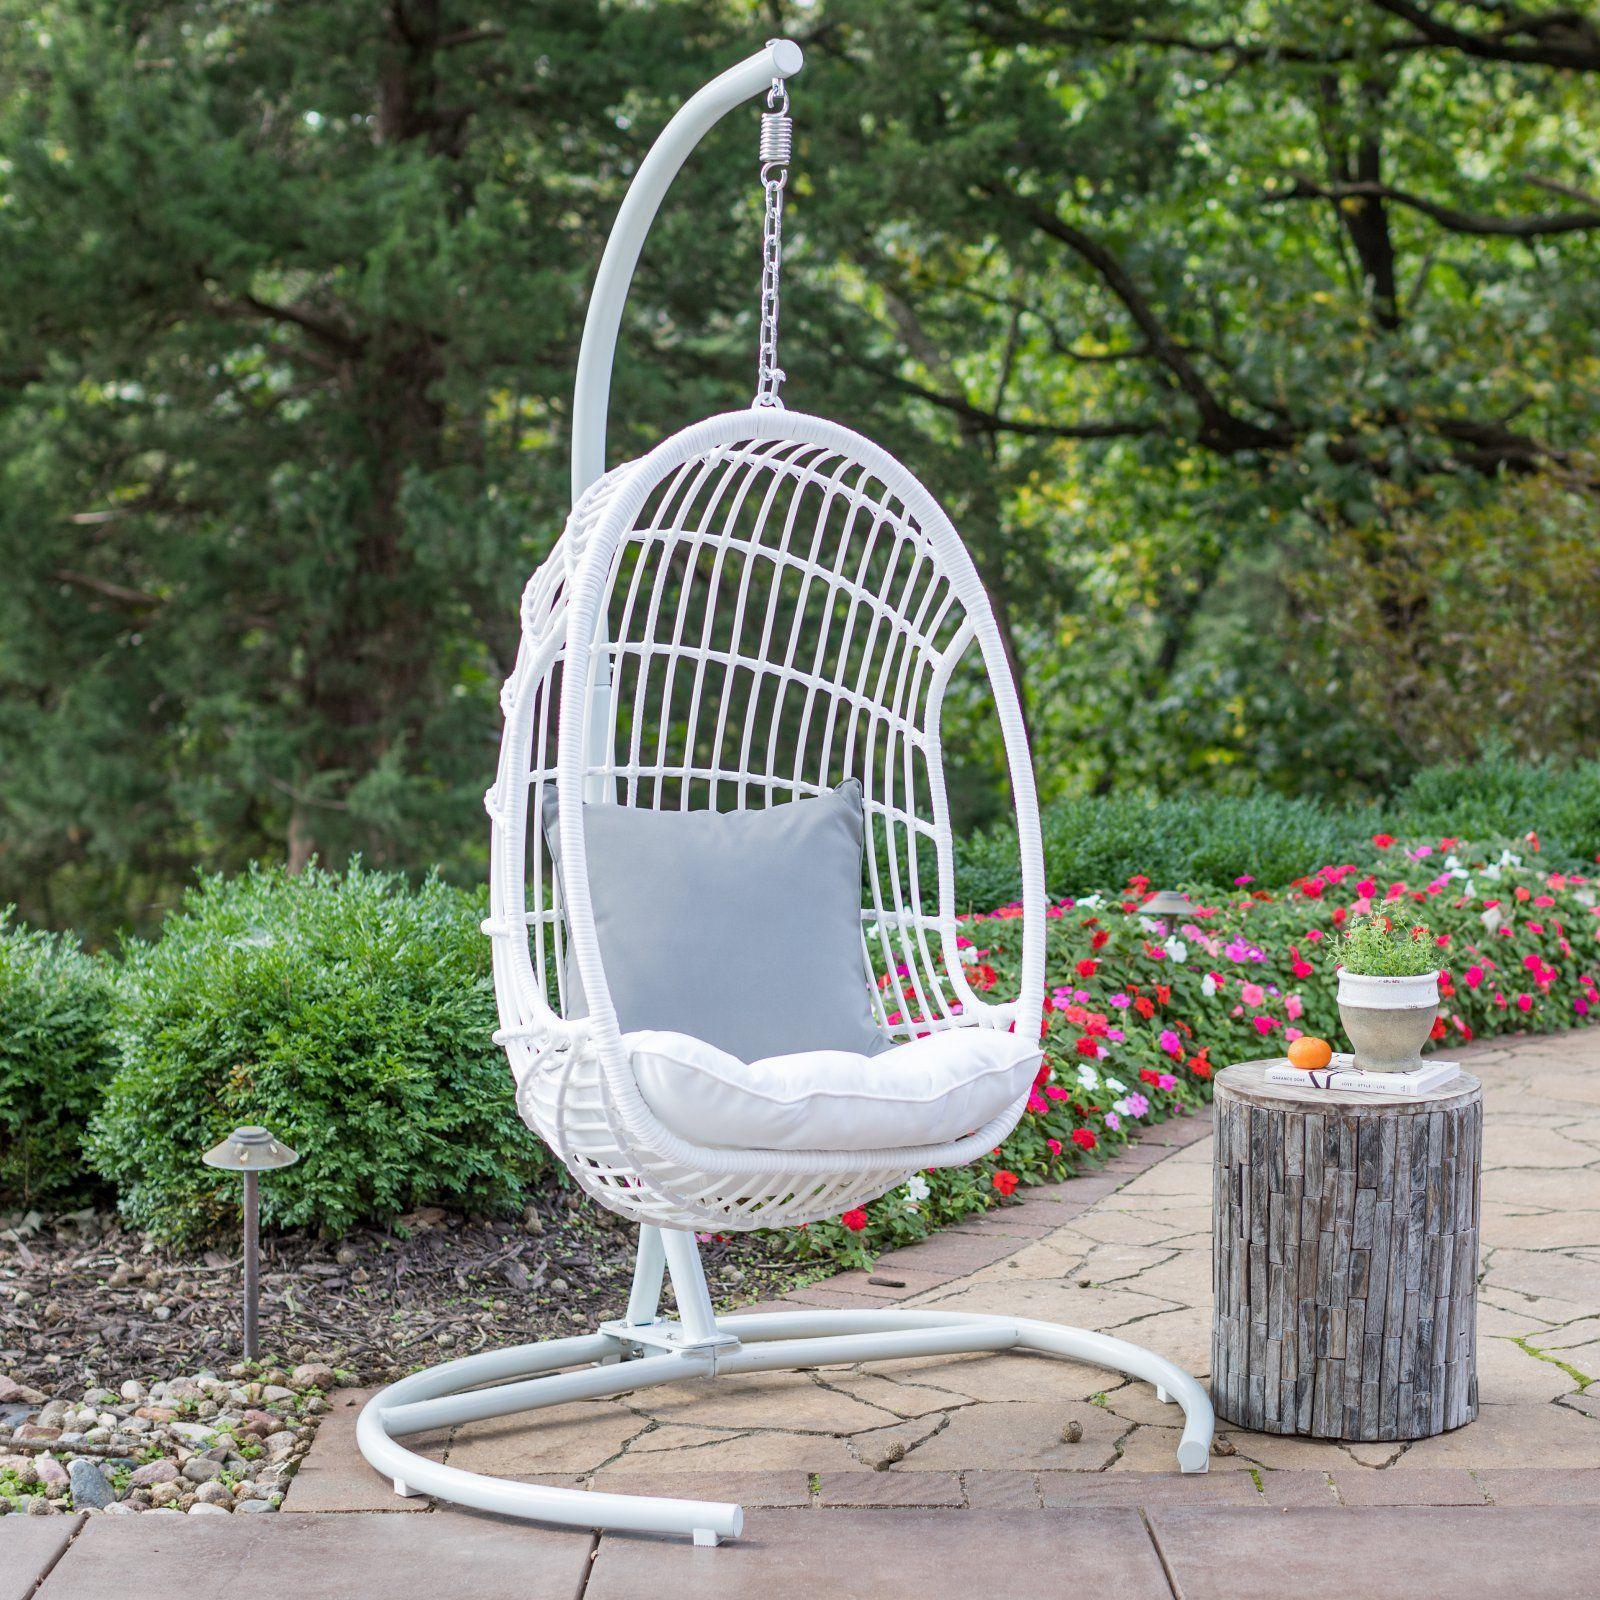 Belham living bali resin wicker hanging egg chair with